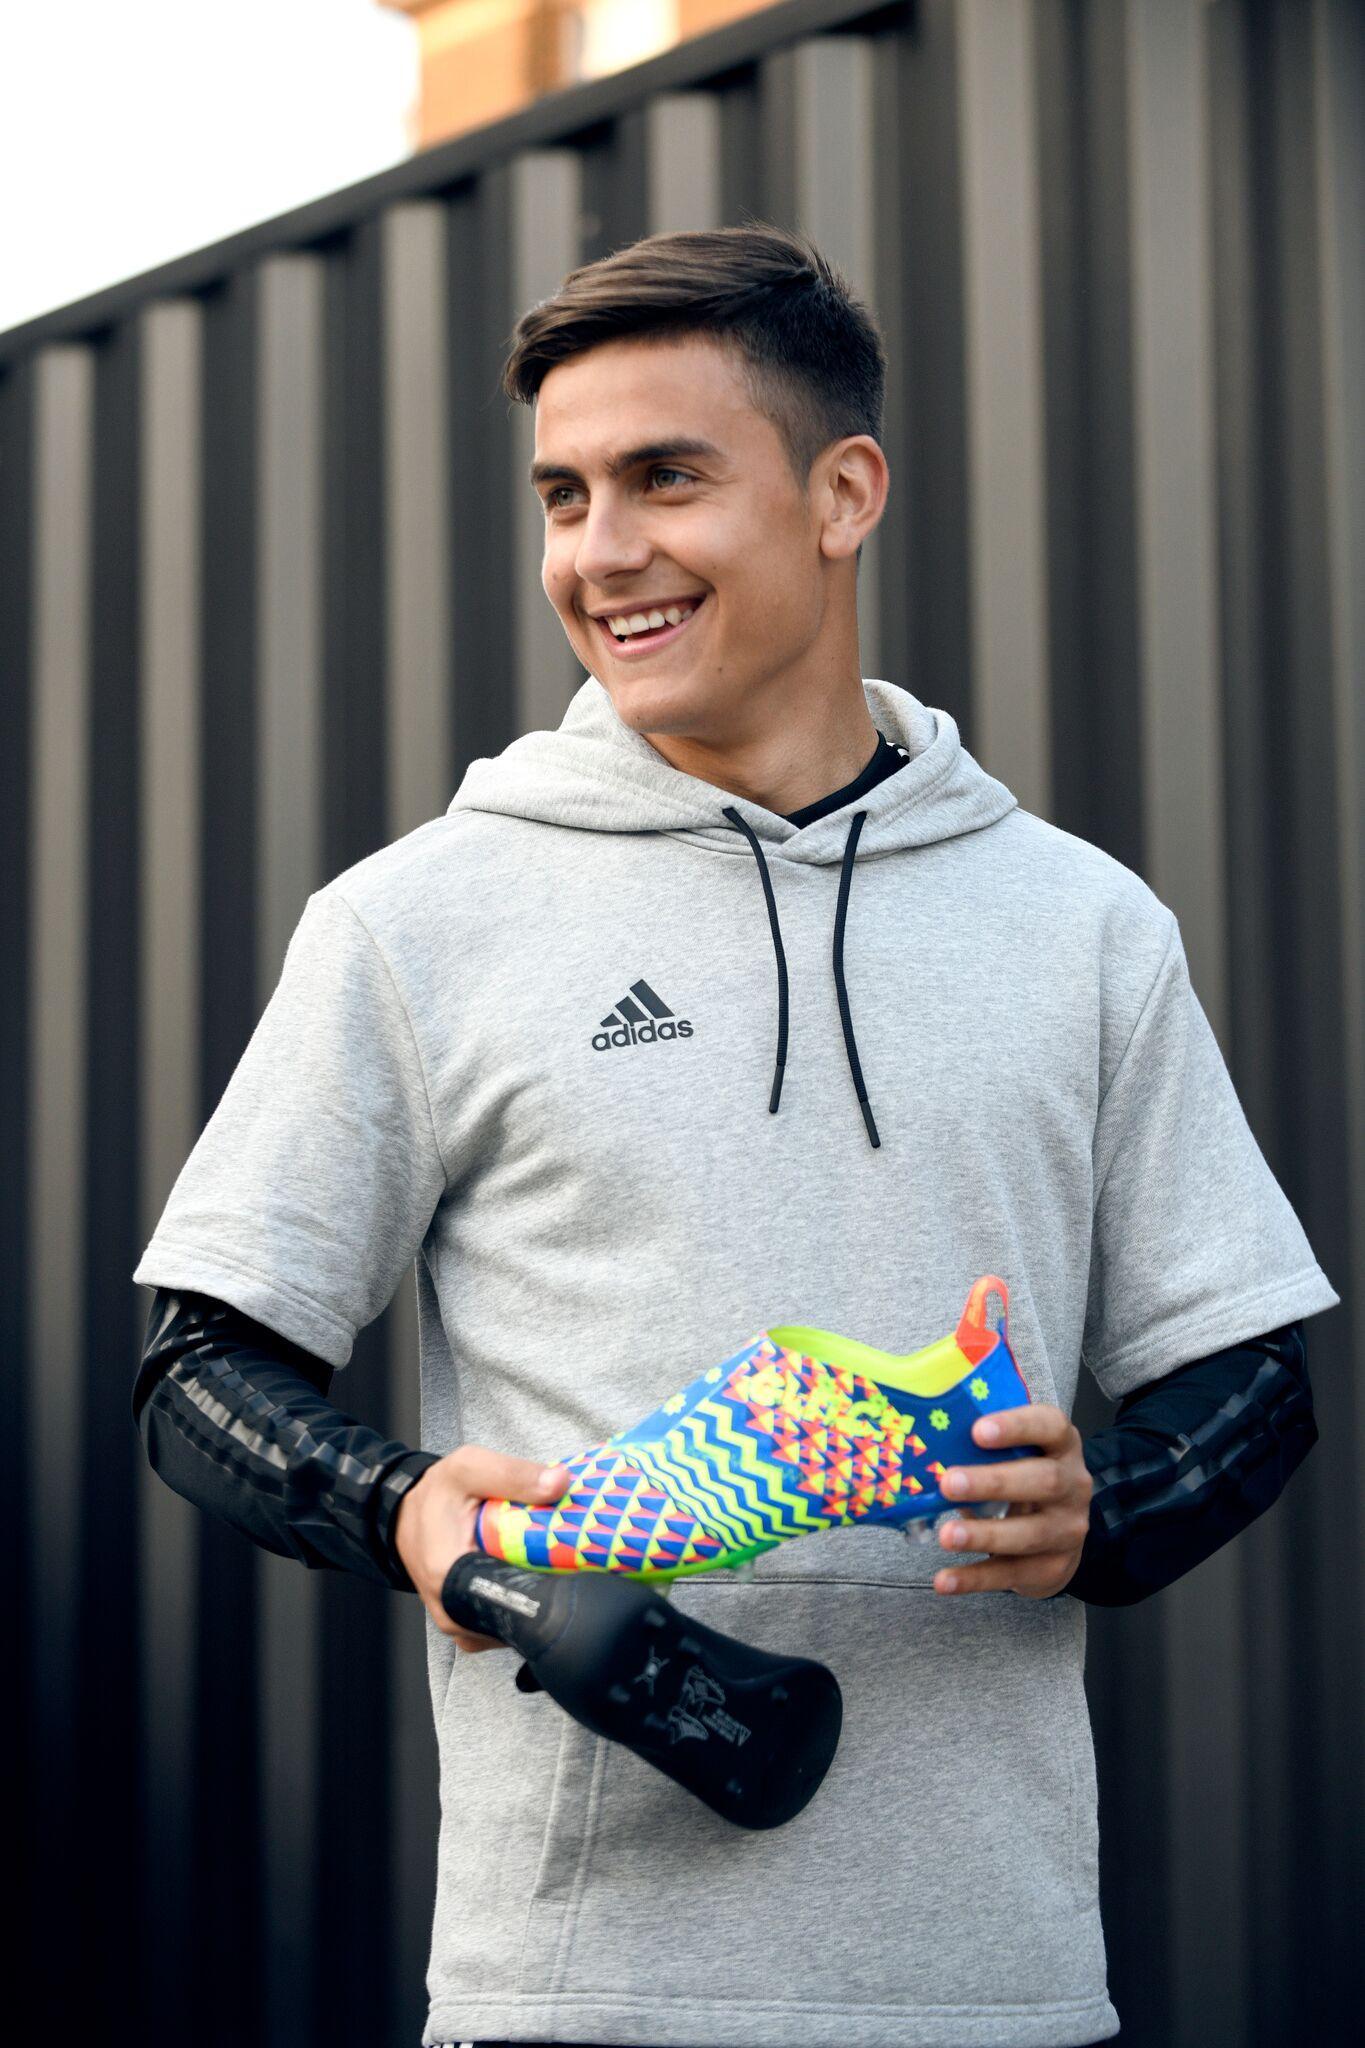 scarpe dybala 2018 adidas